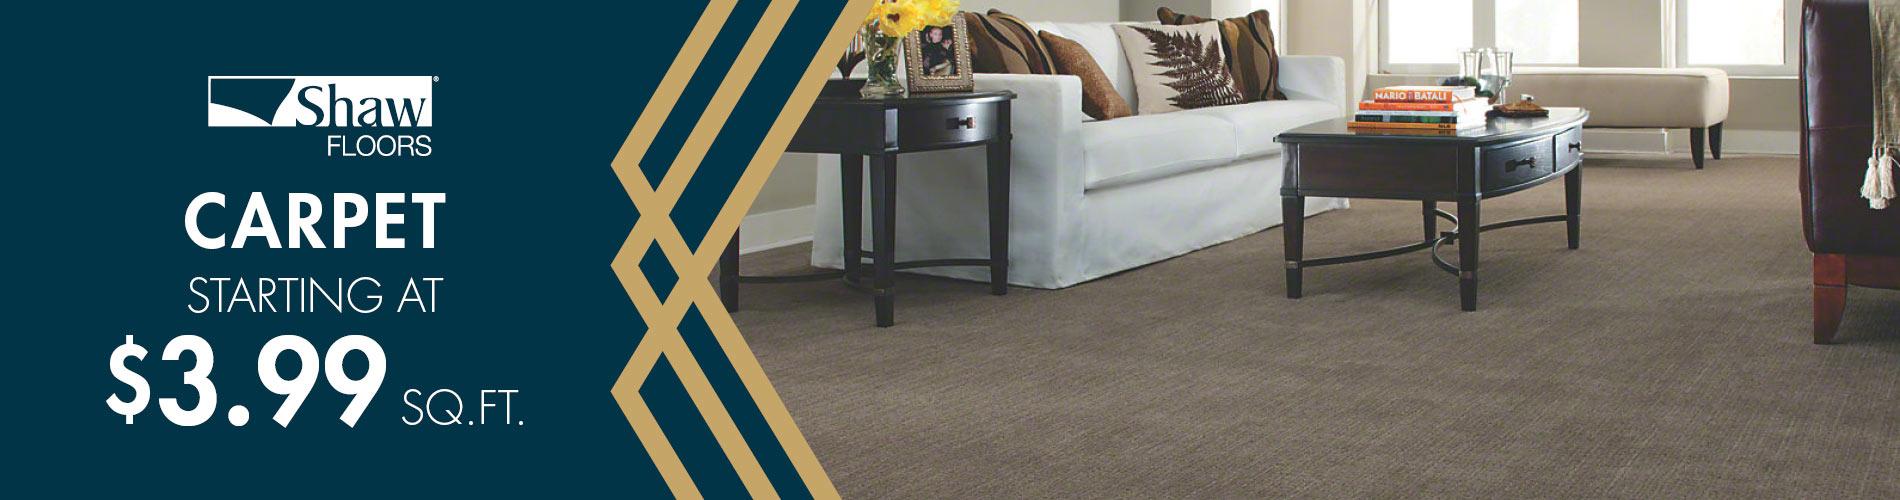 Shaw Floors carpet starting at $3.99 sq. ft.